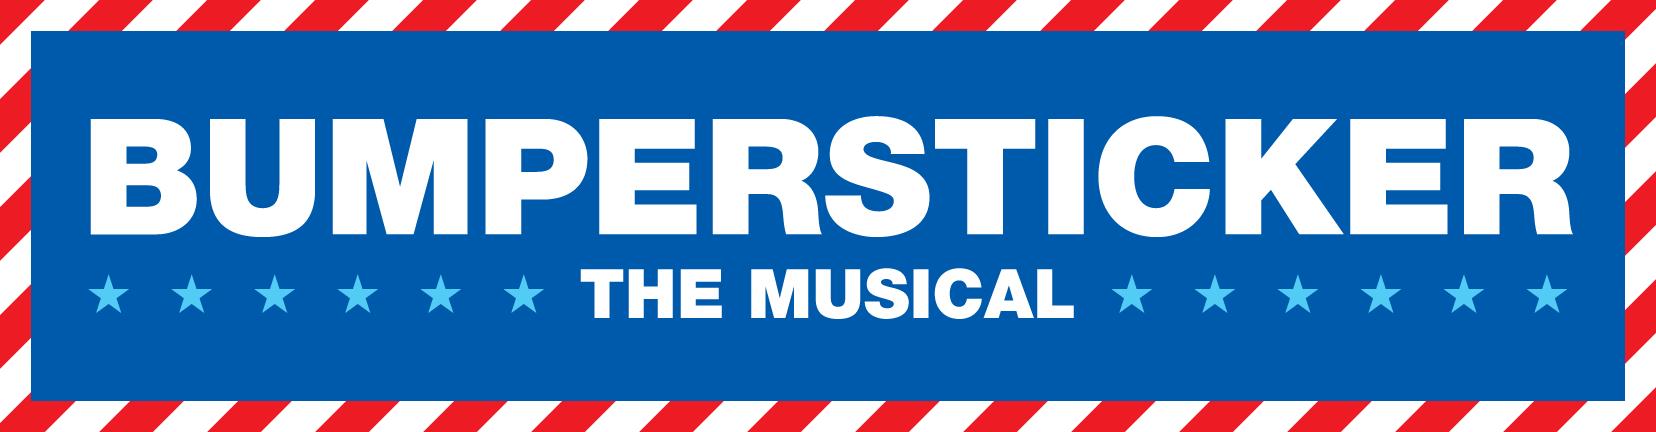 BumperStickerTM_Logo_002 copy